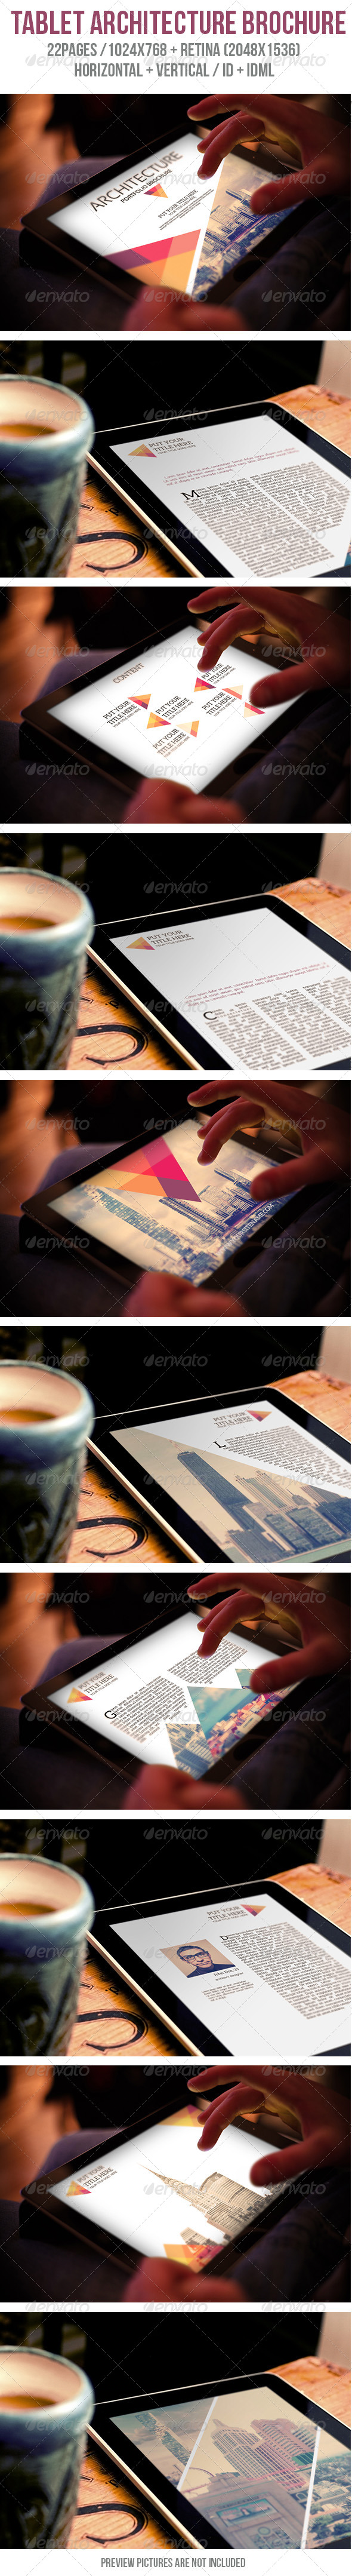 iPad & Tablet Architecture Porfolio Brochure - Digital Magazines ePublishing